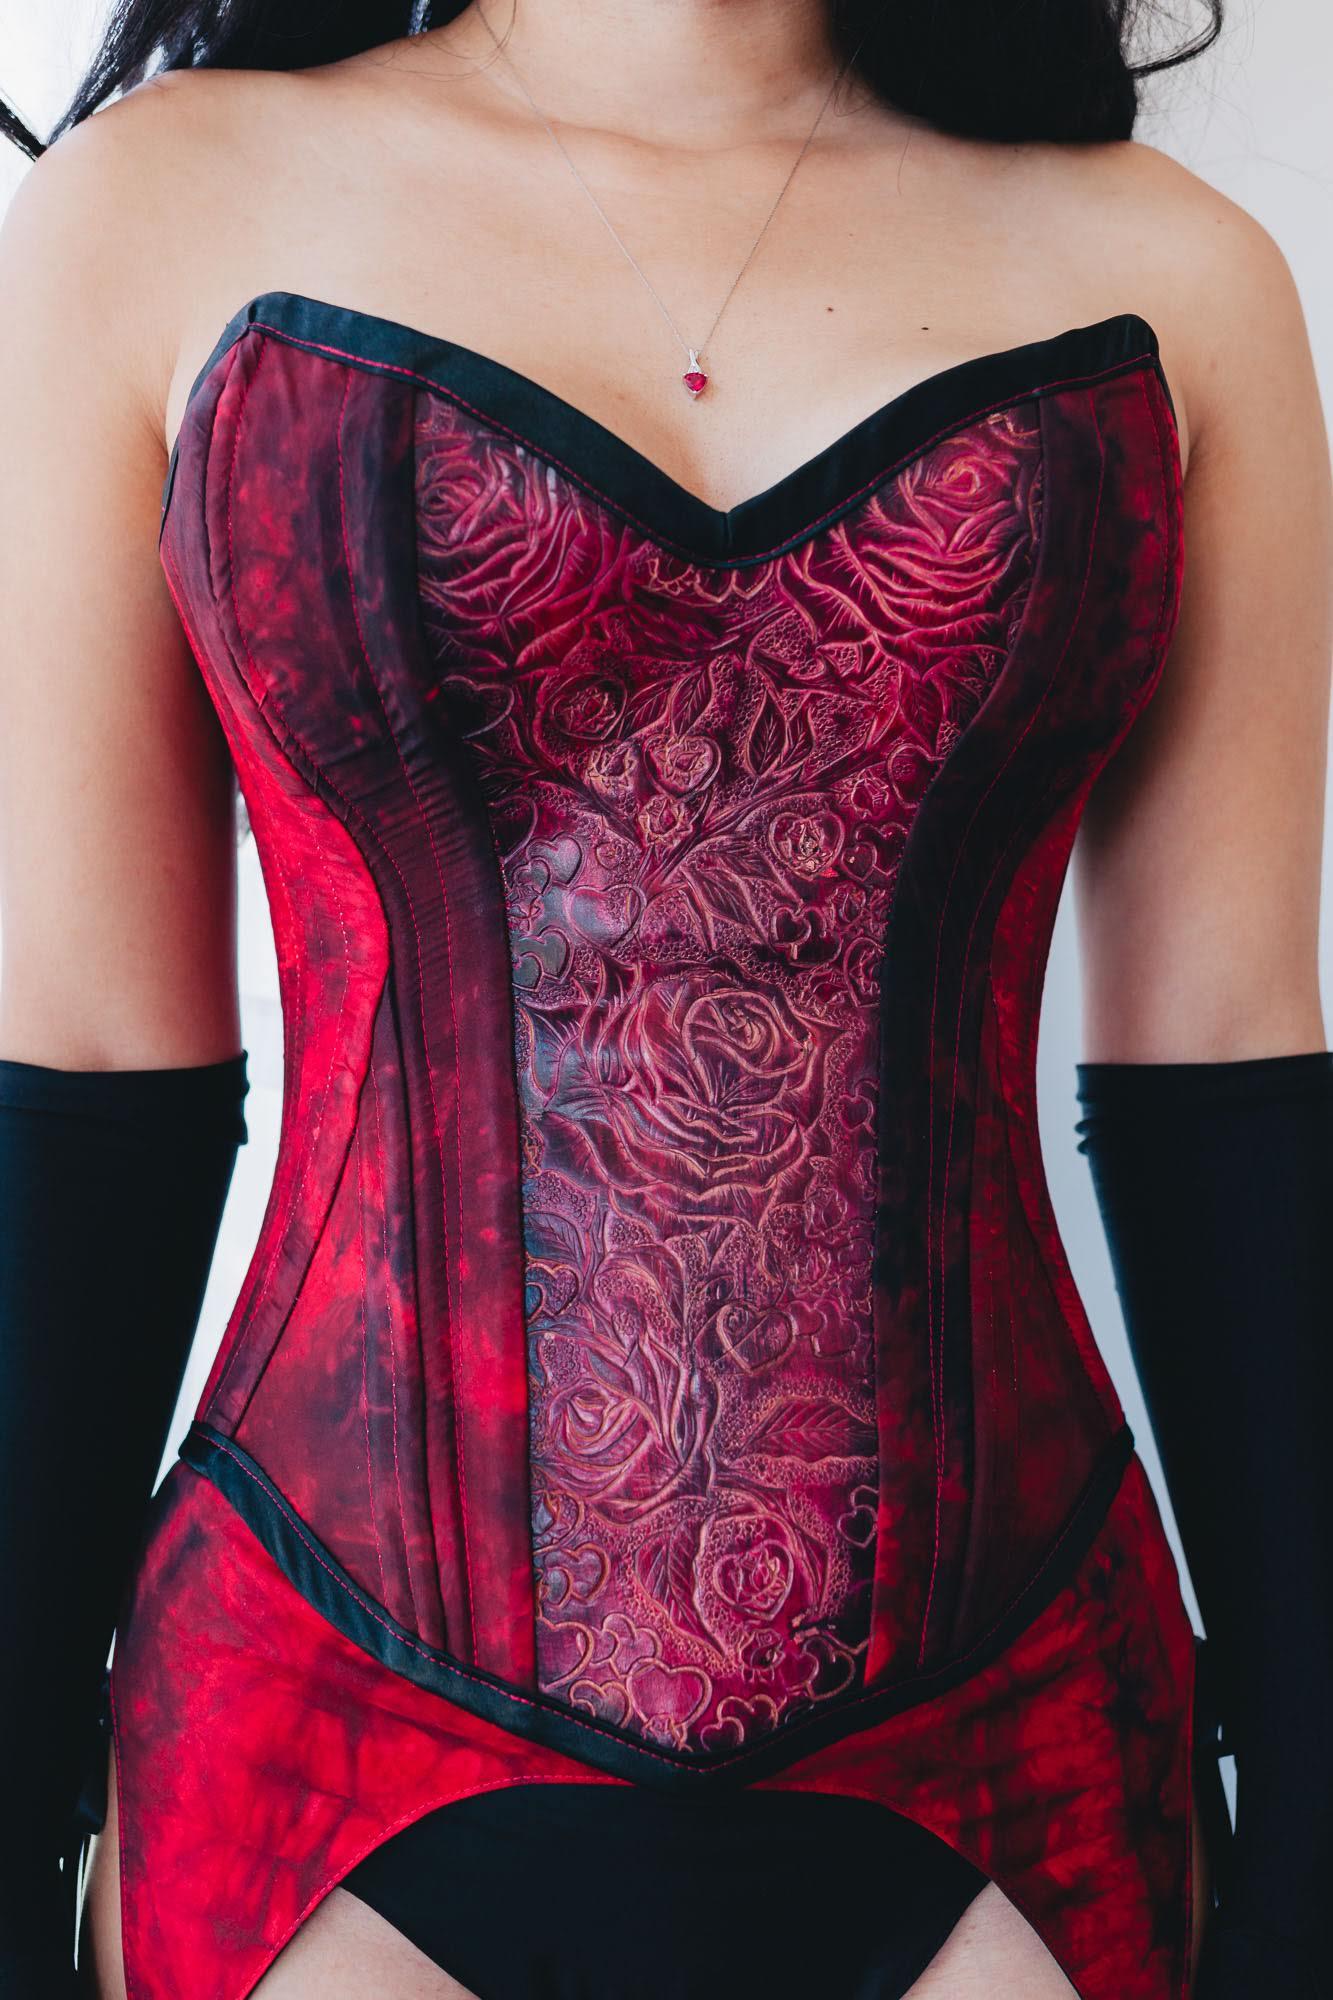 Queen-of-Hearts-leather-corset.jpg